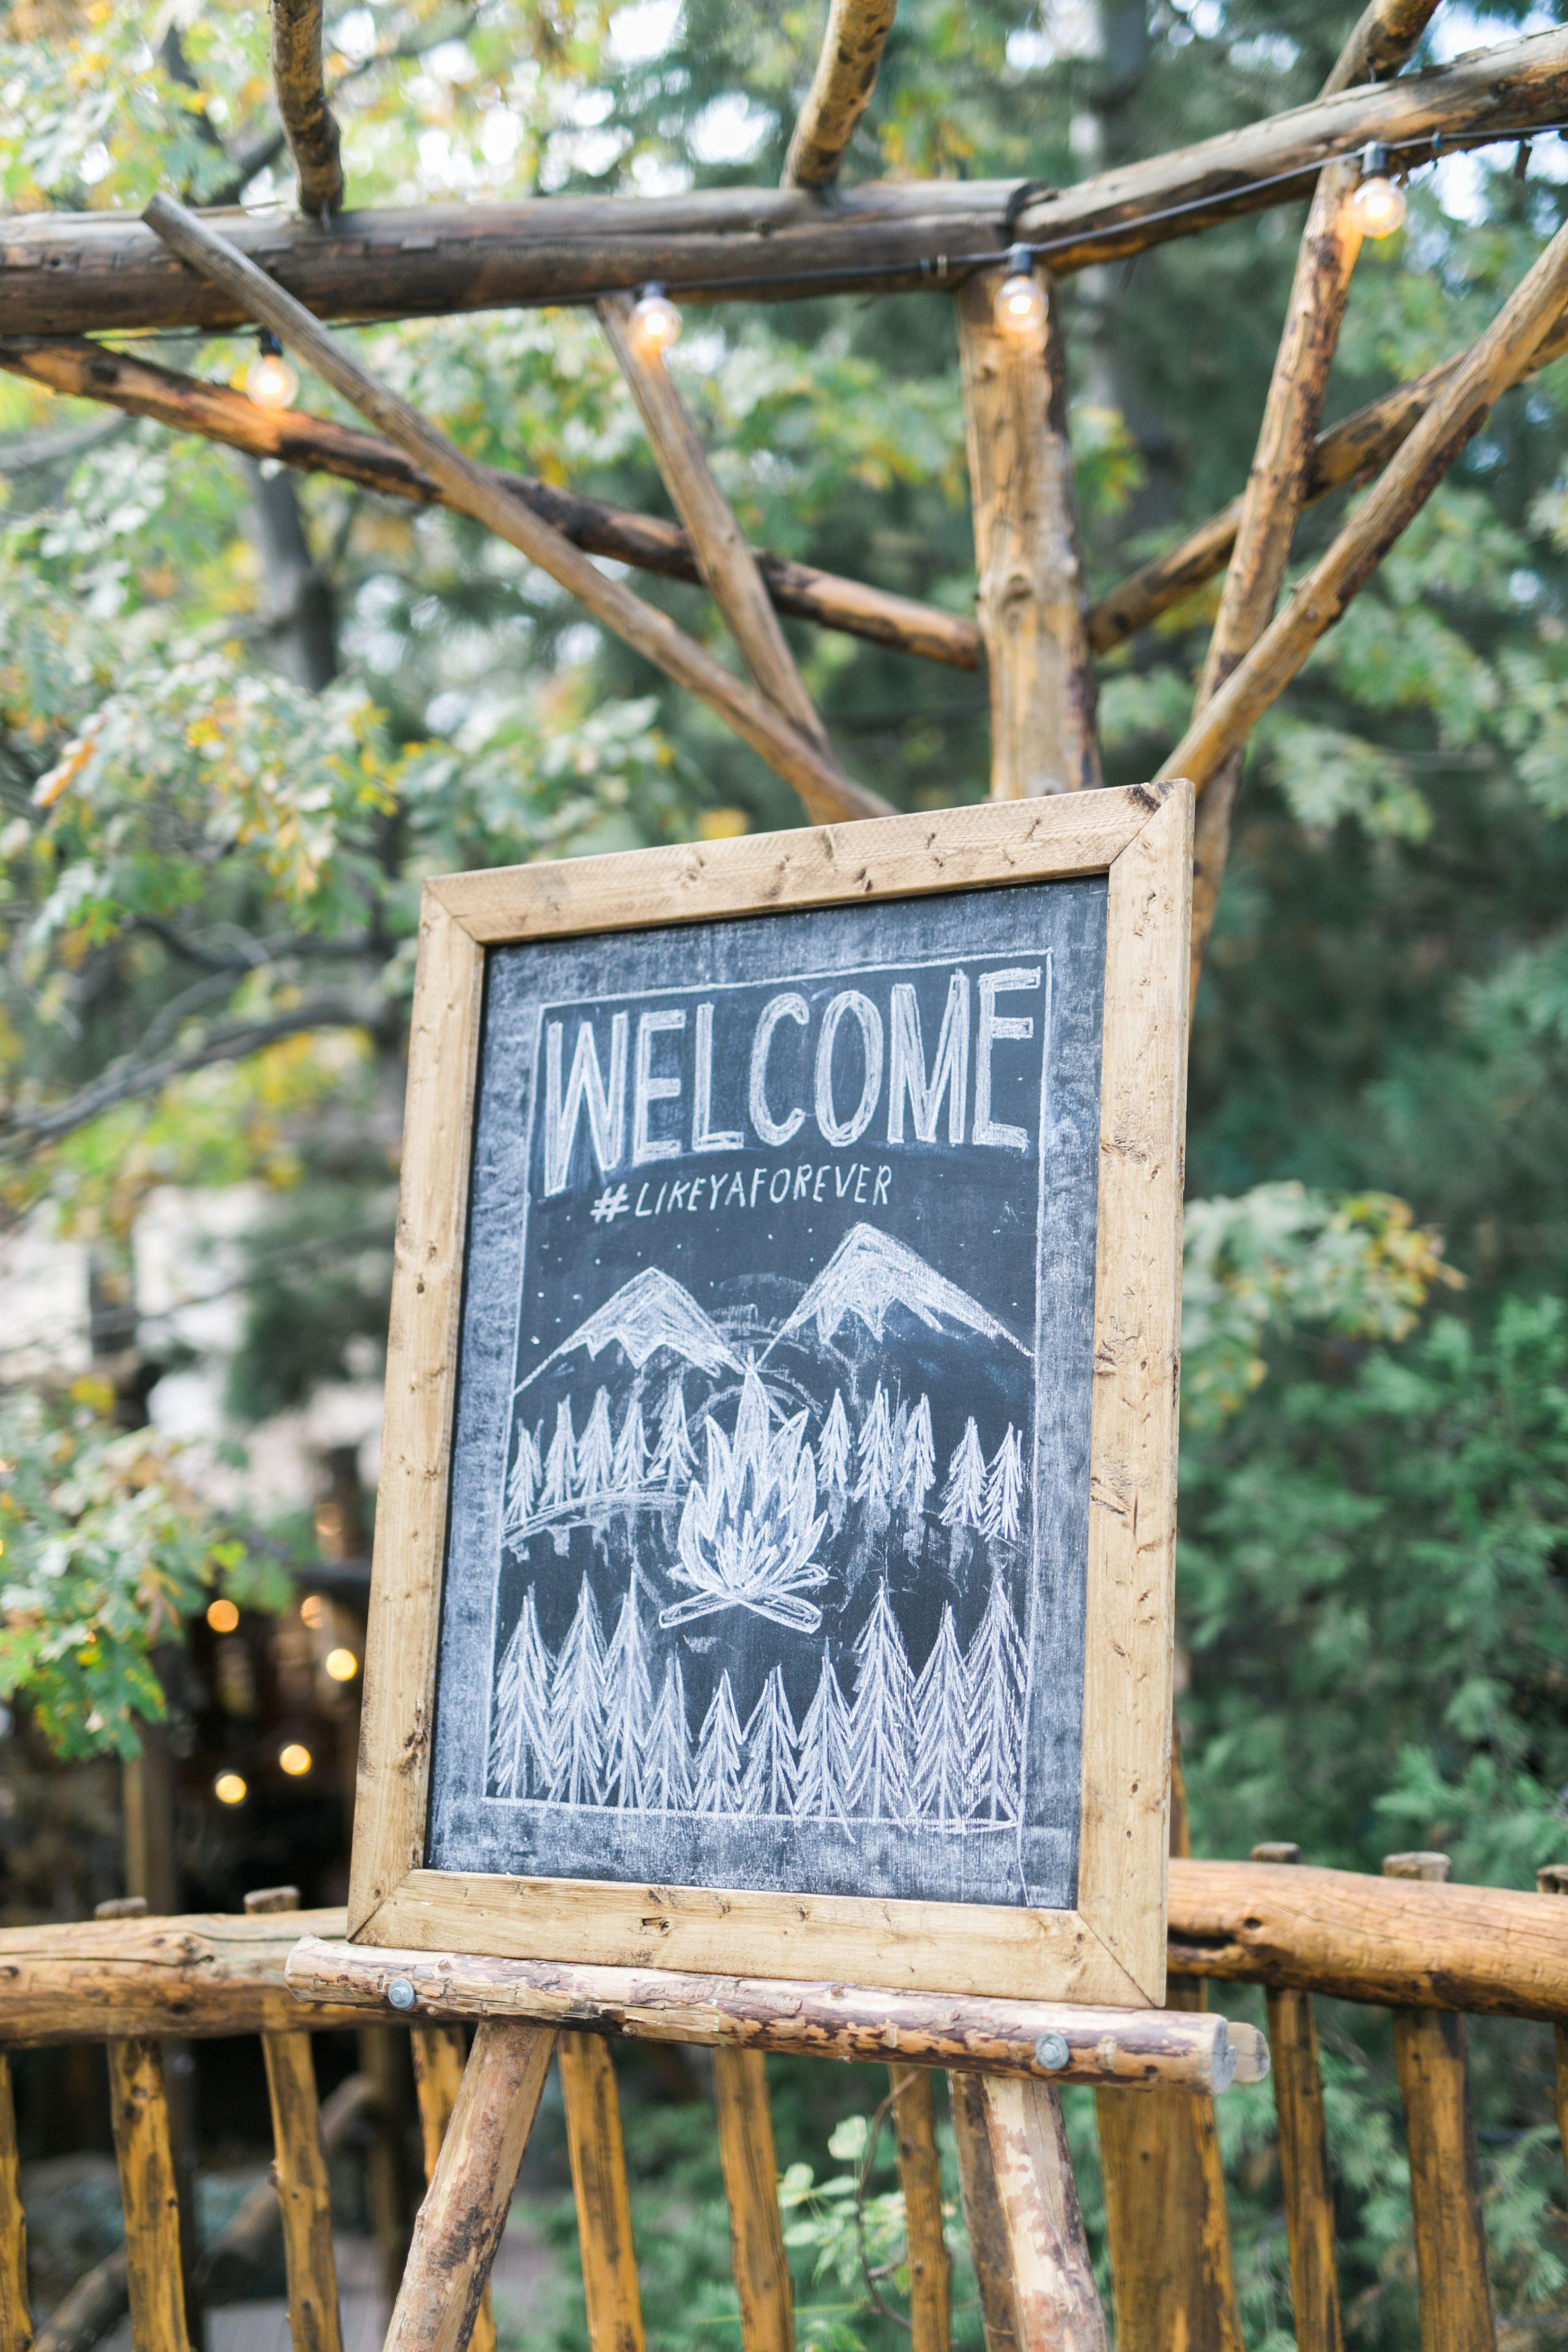 Forest Wedding Venue-Pine Rose Weddings in So. California ...